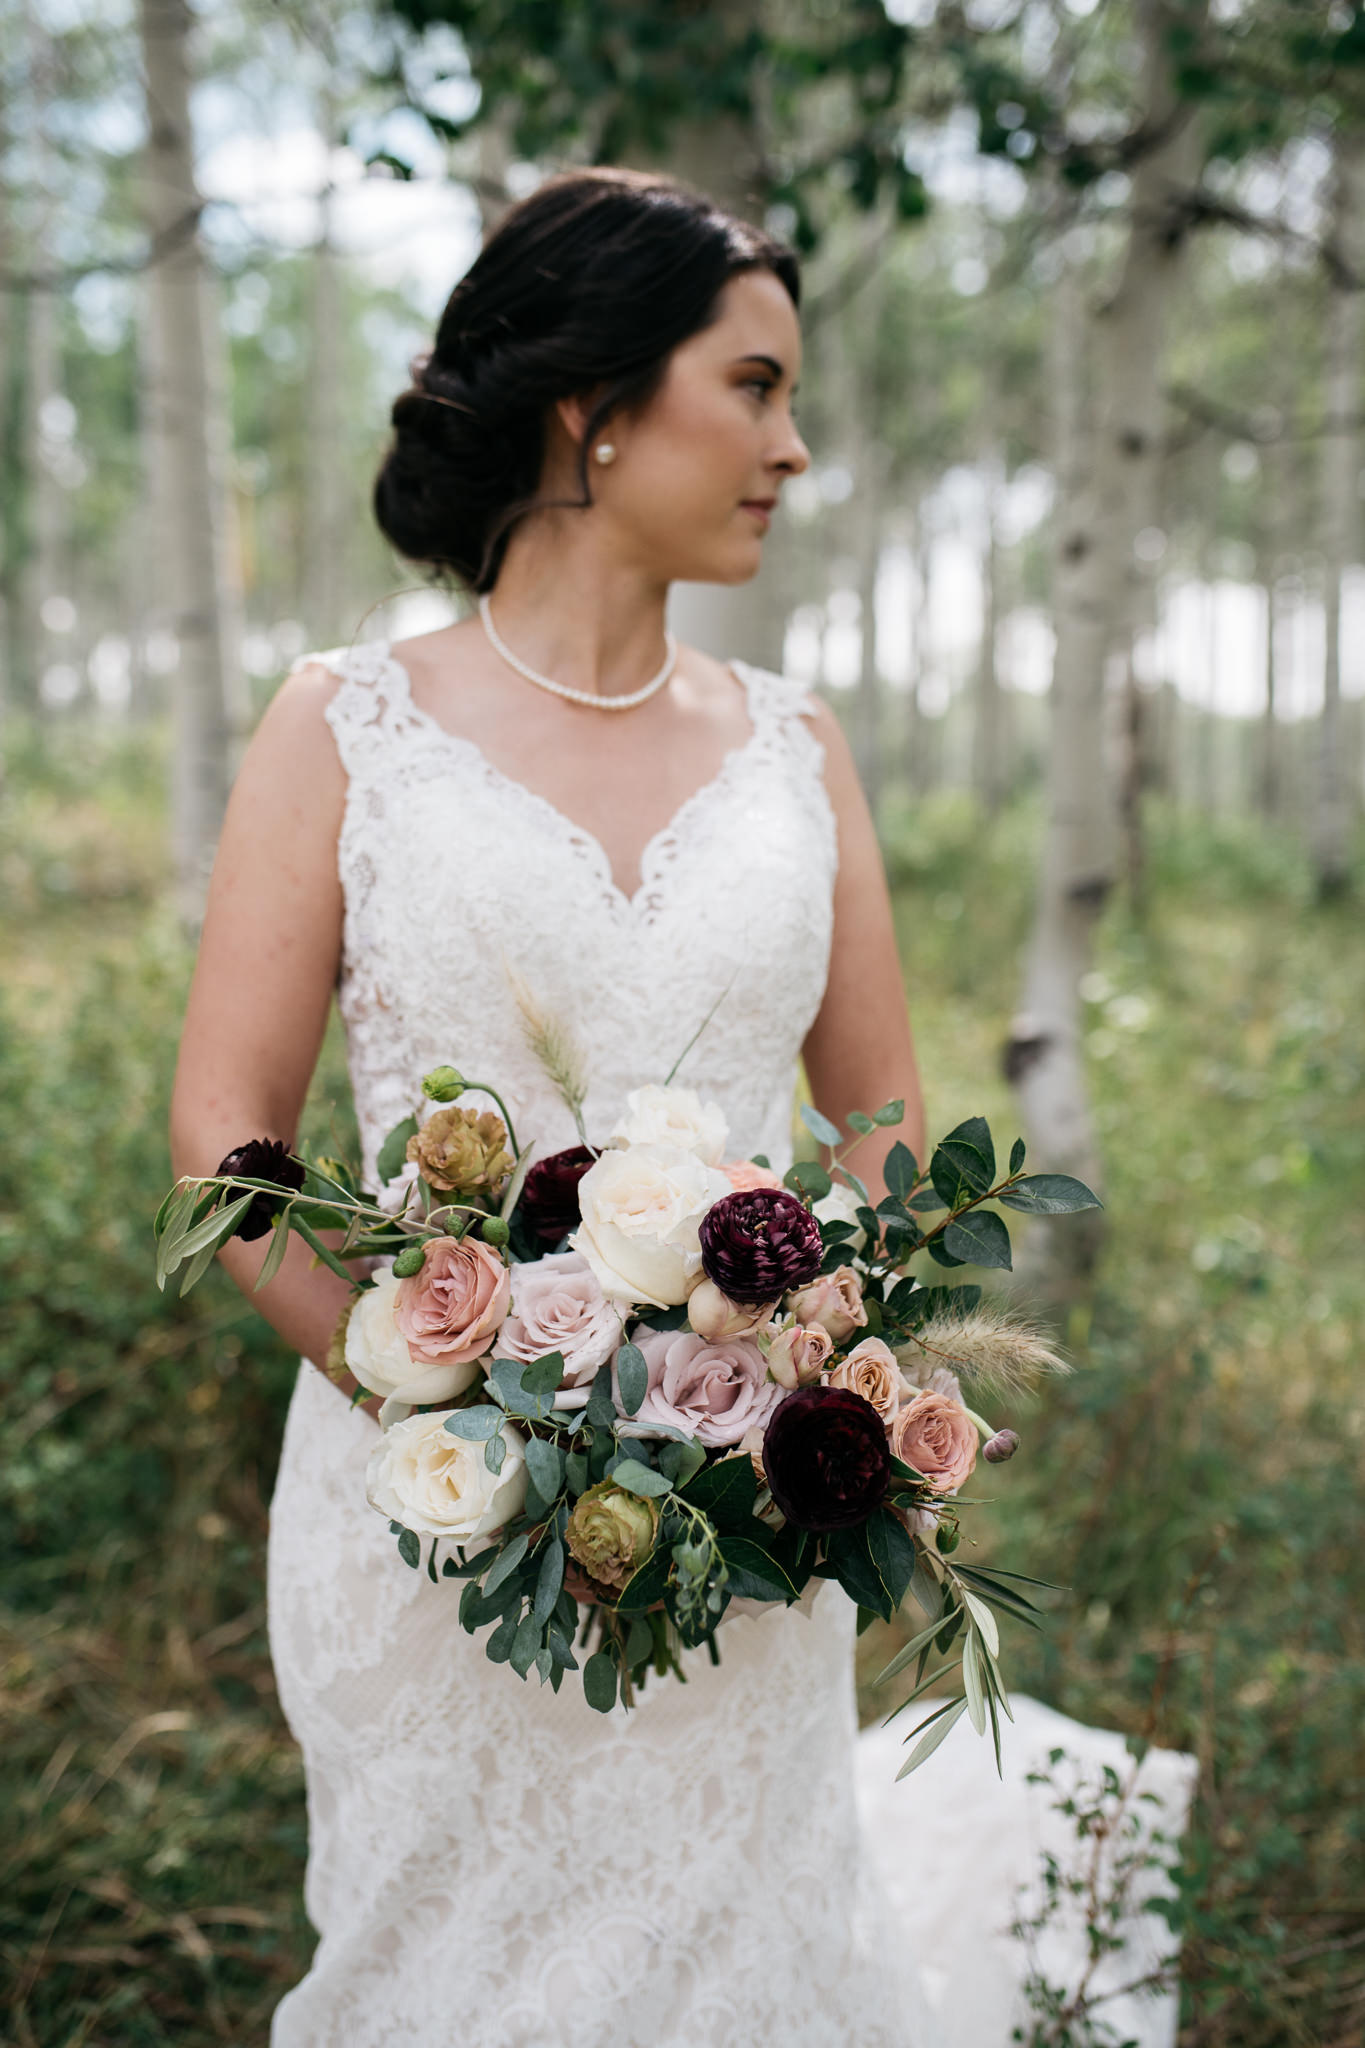 133_ONL_Kat_Nick_Wedding_Trevor_Hooper_Photo.jpg